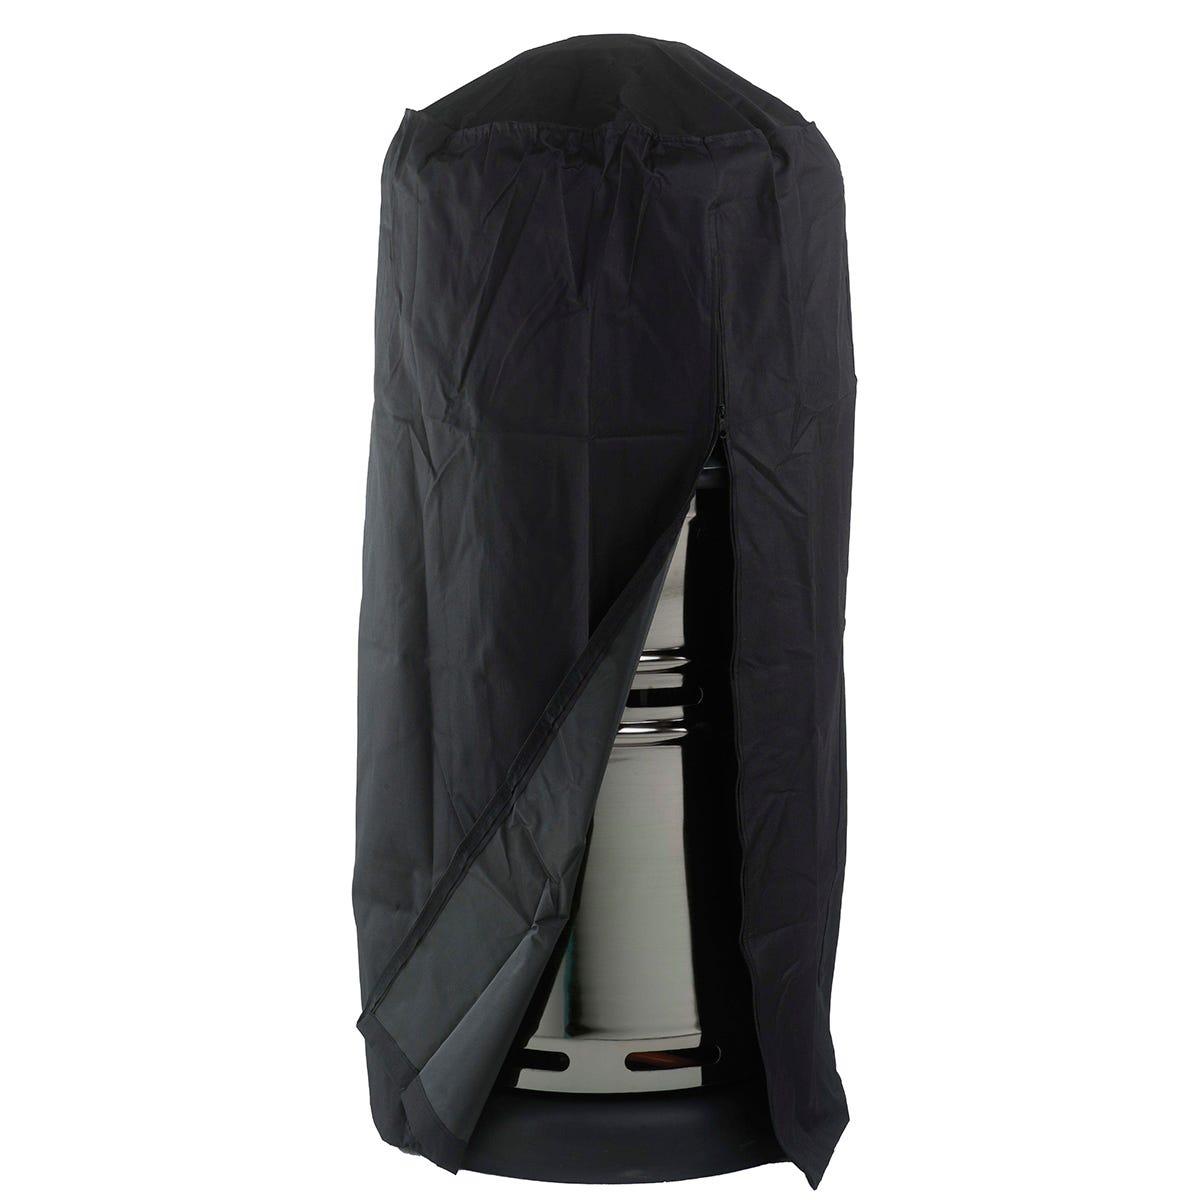 Lifestyle Appliances Santorini Patio Heater Cover